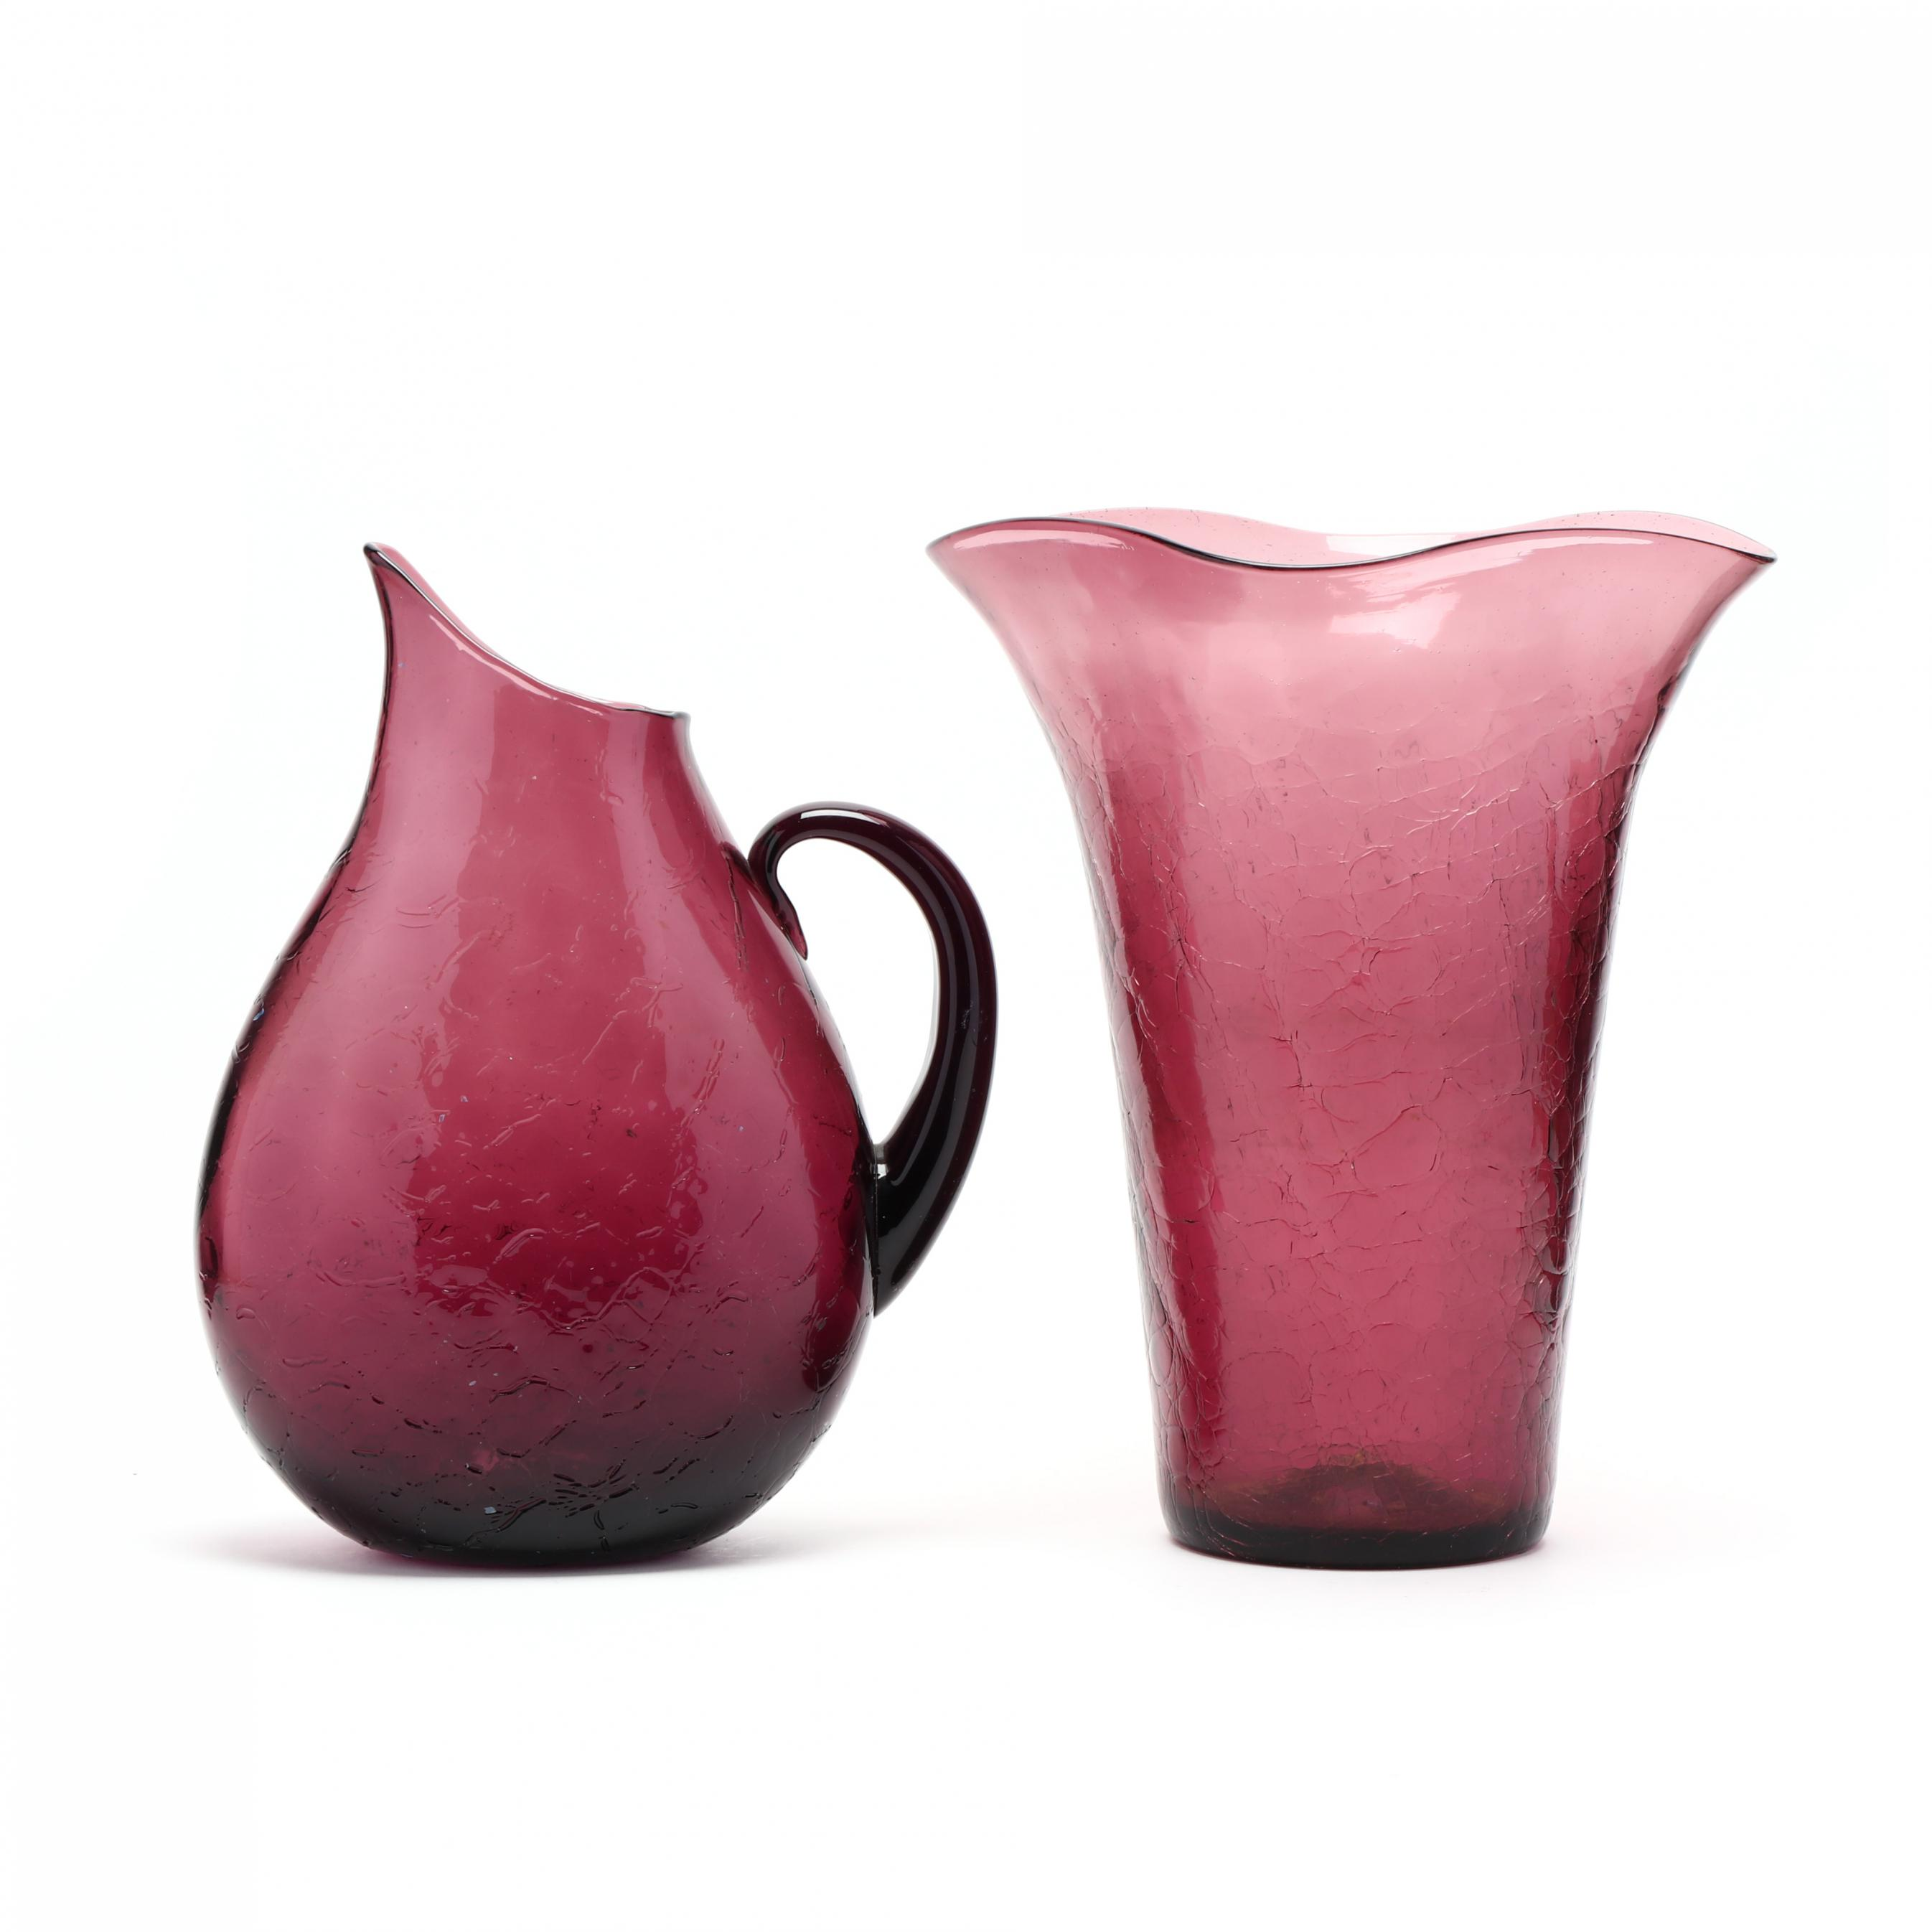 blenko-large-purple-crackle-glass-vase-and-pitcher